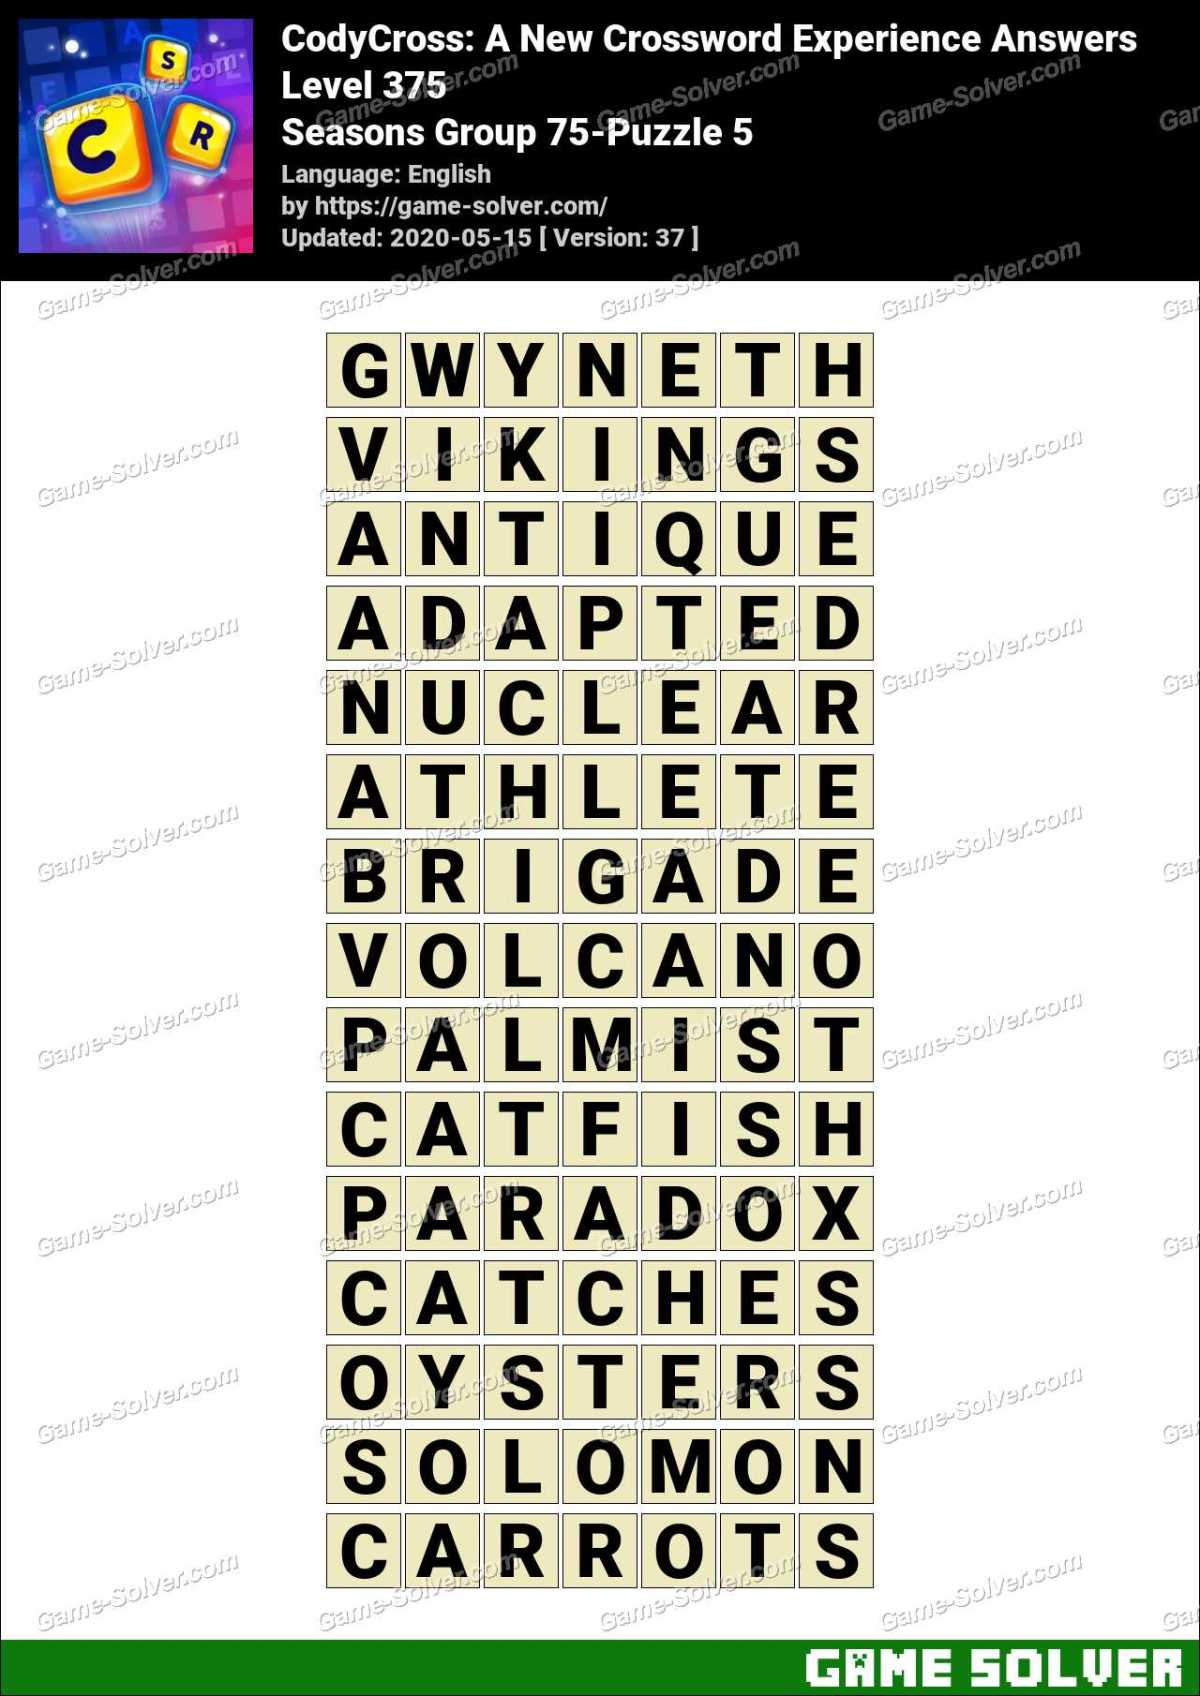 CodyCross Seasons Group 75-Puzzle 5 Answers